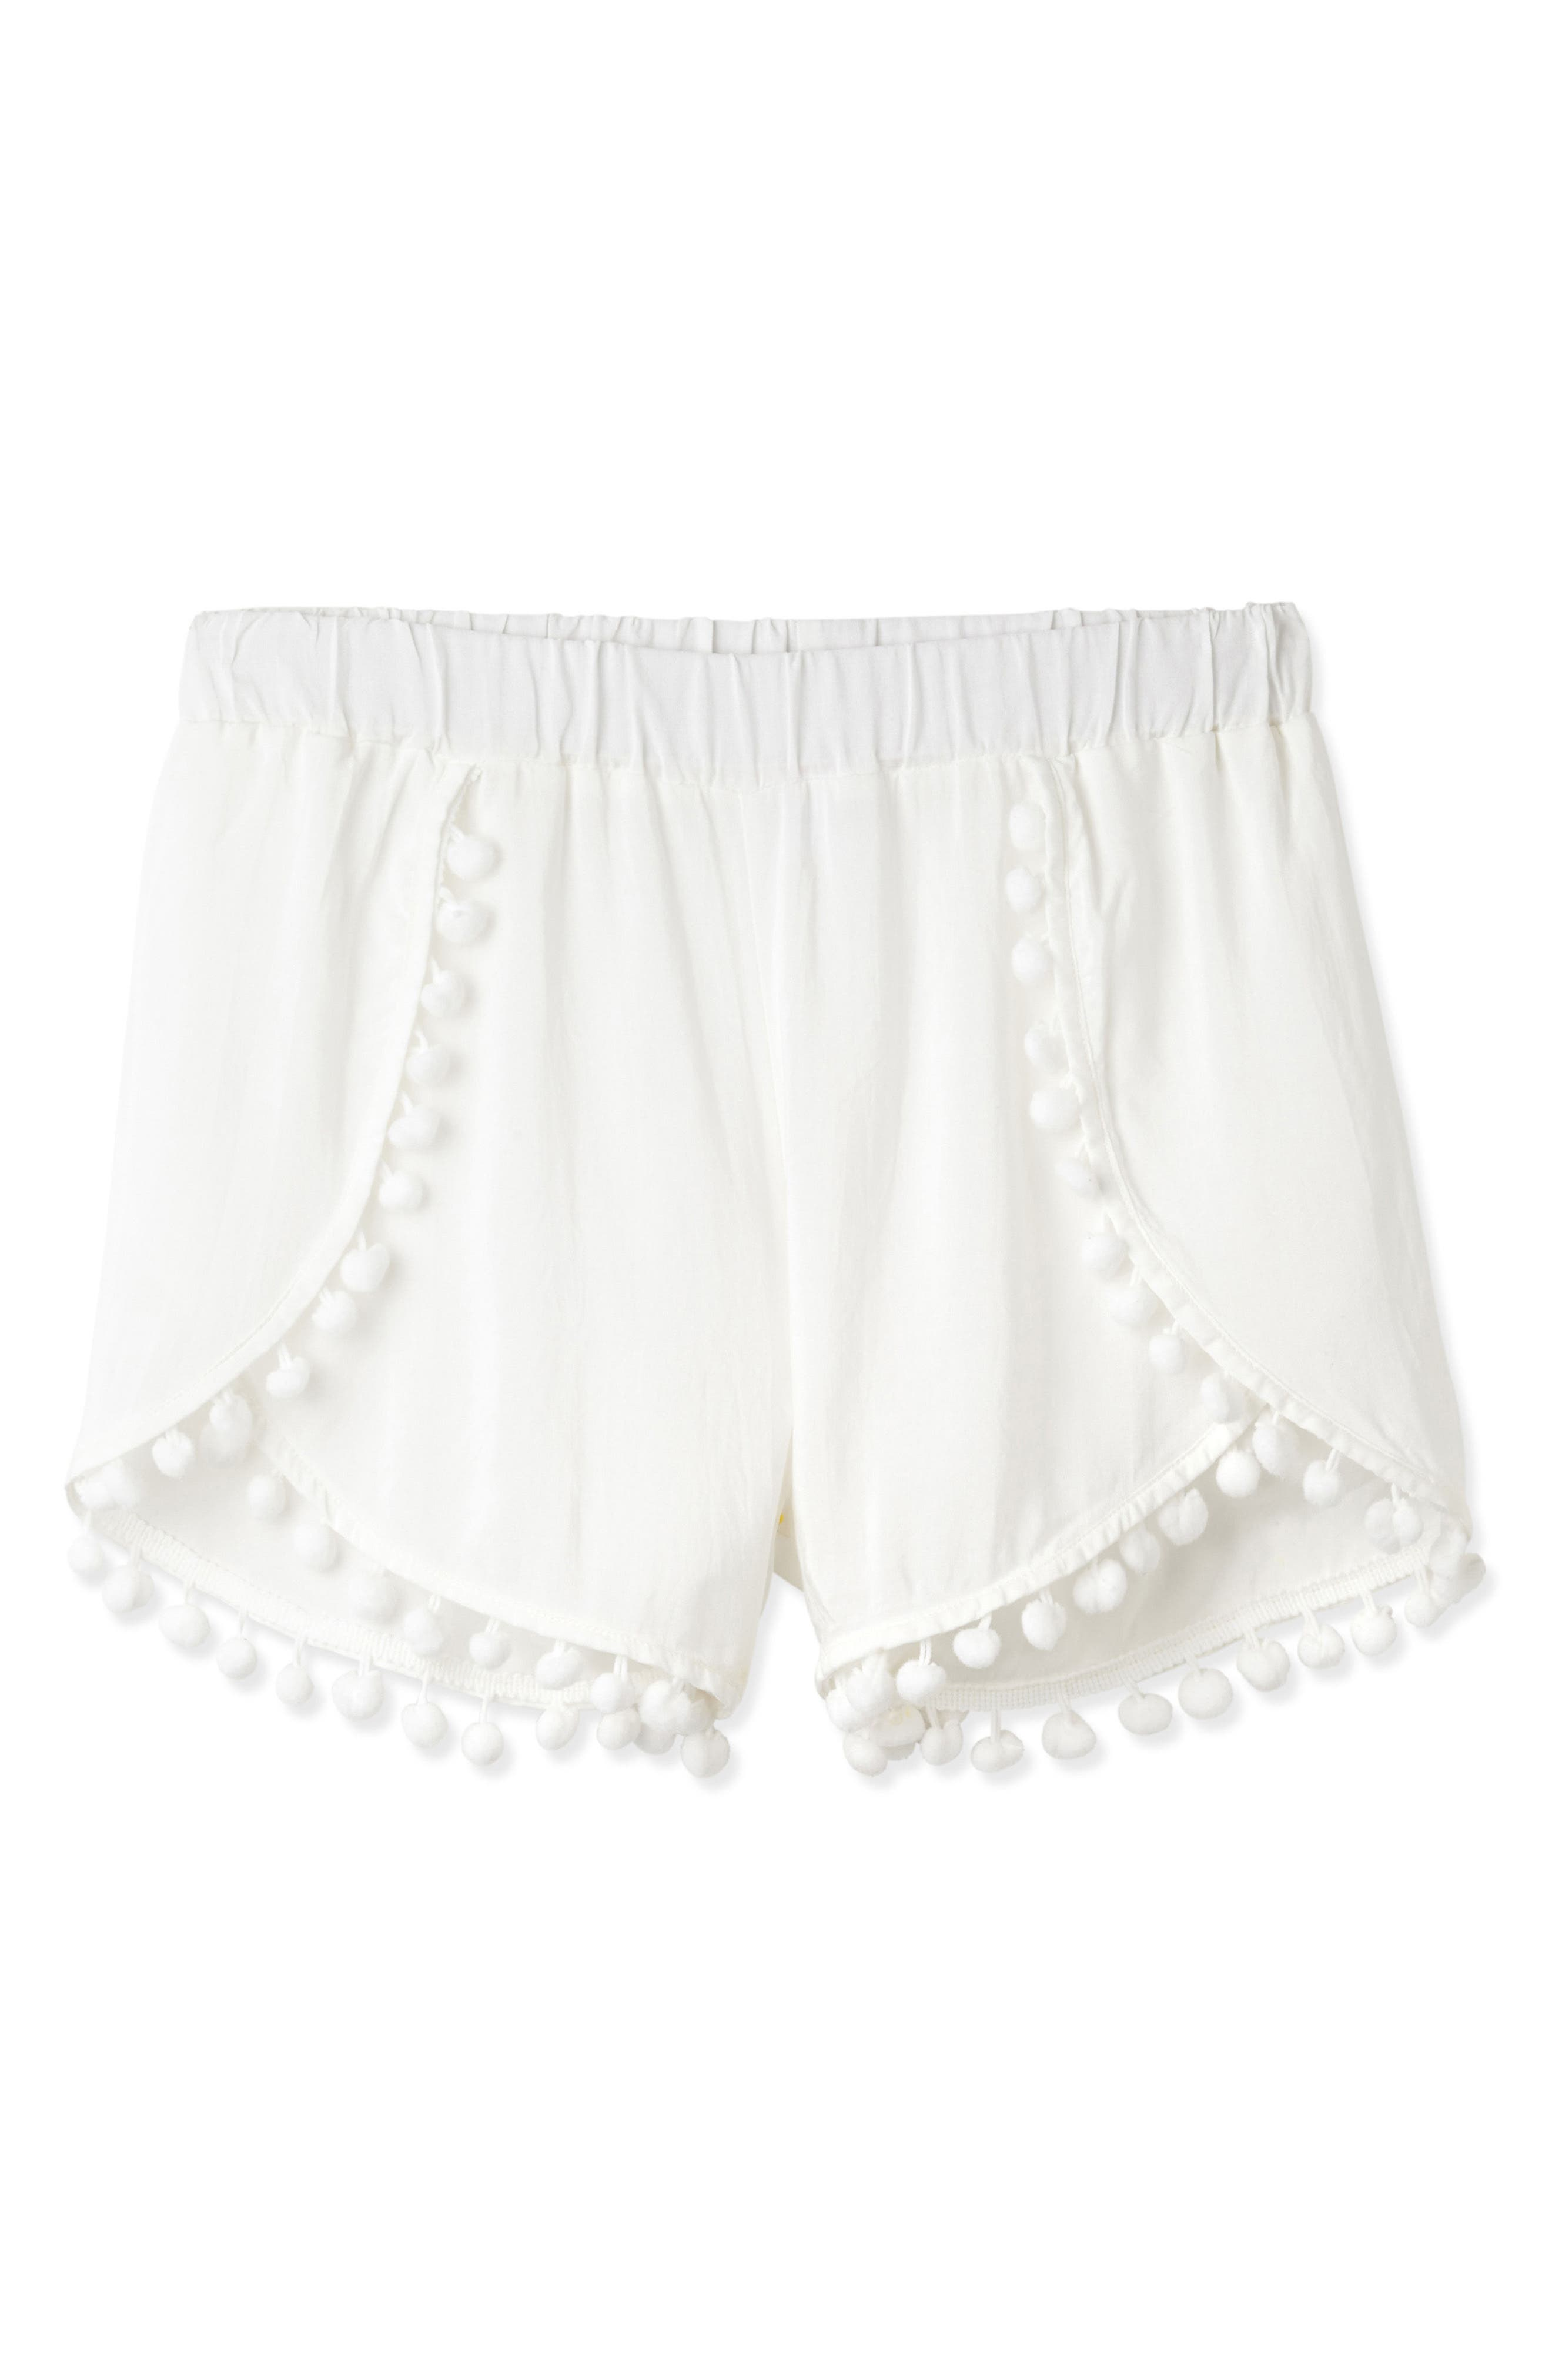 Pompom Cover-Up Shorts,                         Main,                         color, White